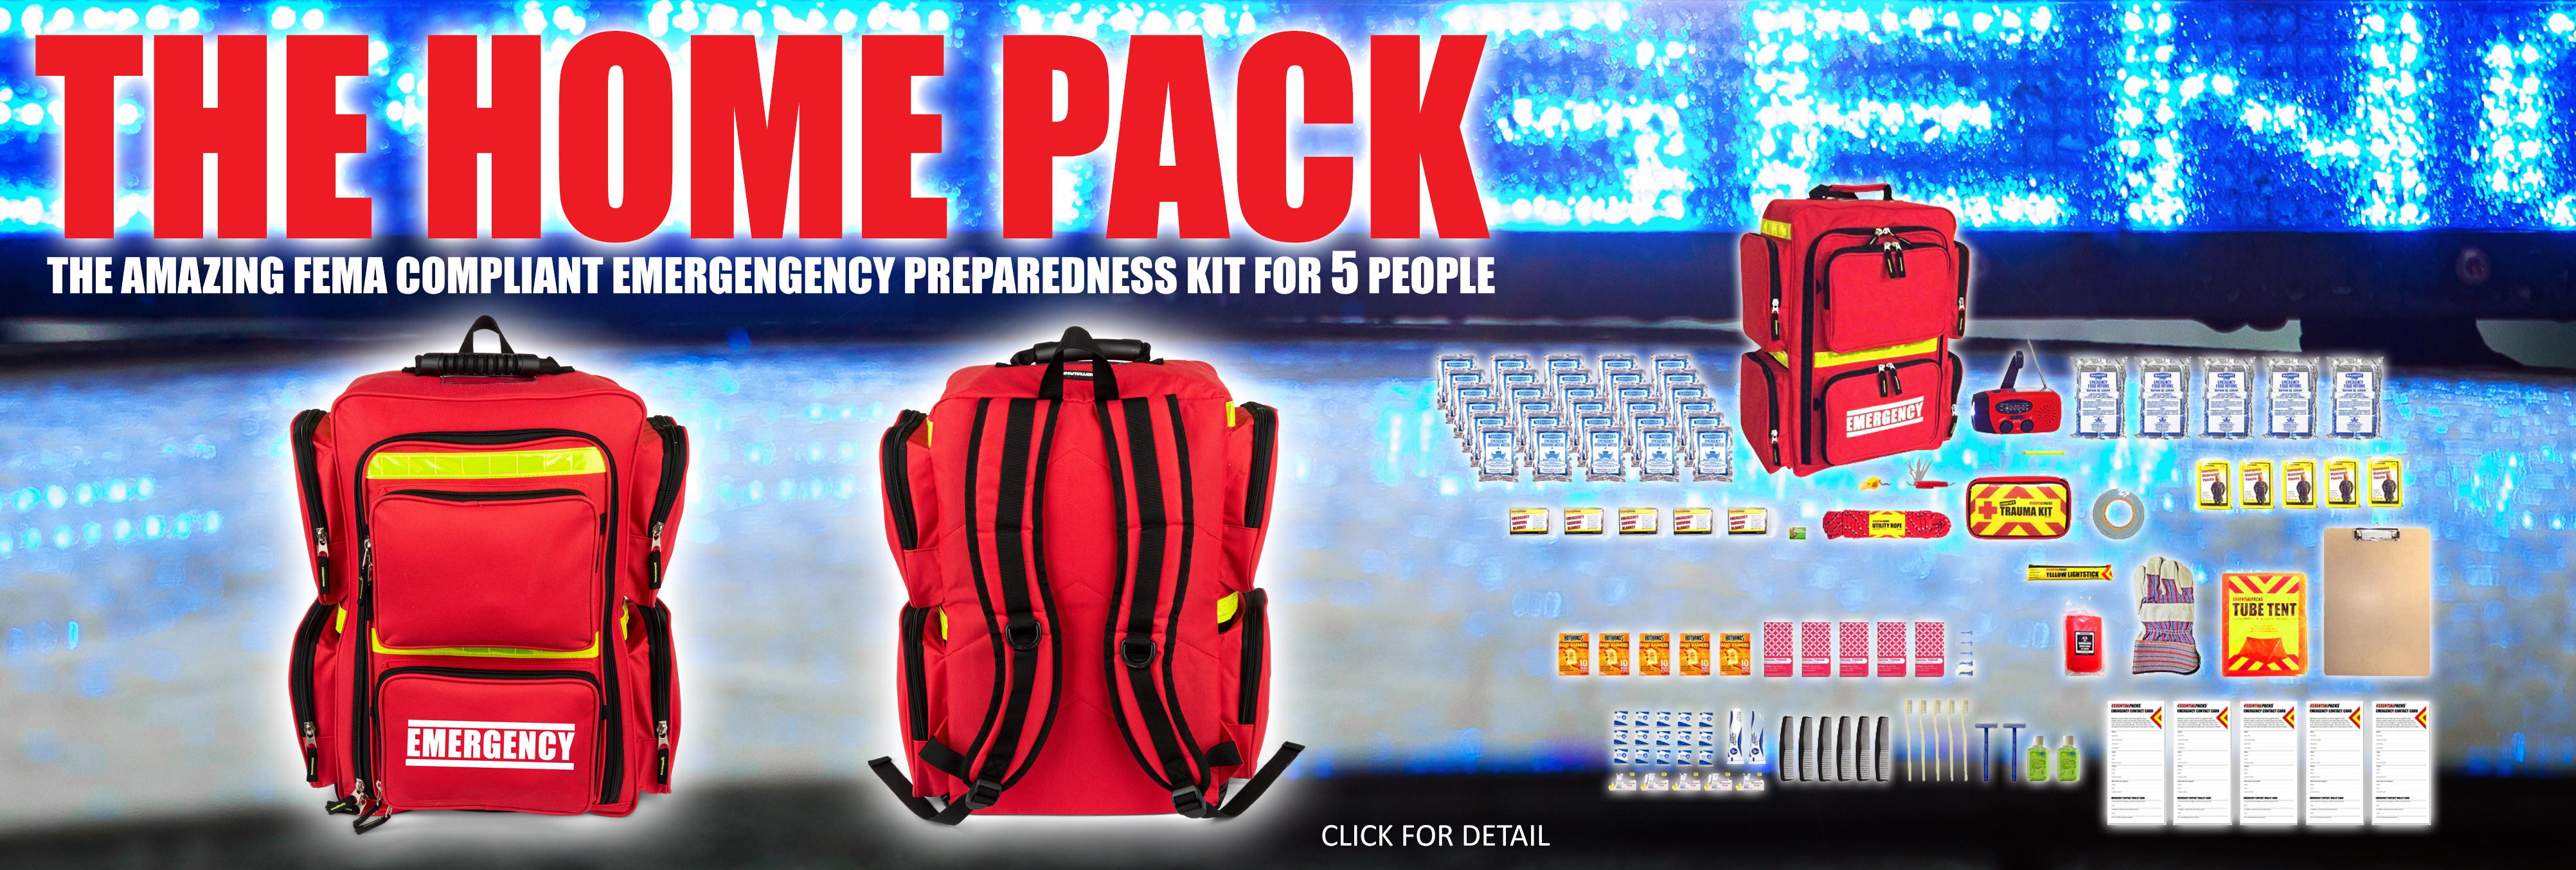 FEMA Compliant Emergency Preparedness Kit for 5 People